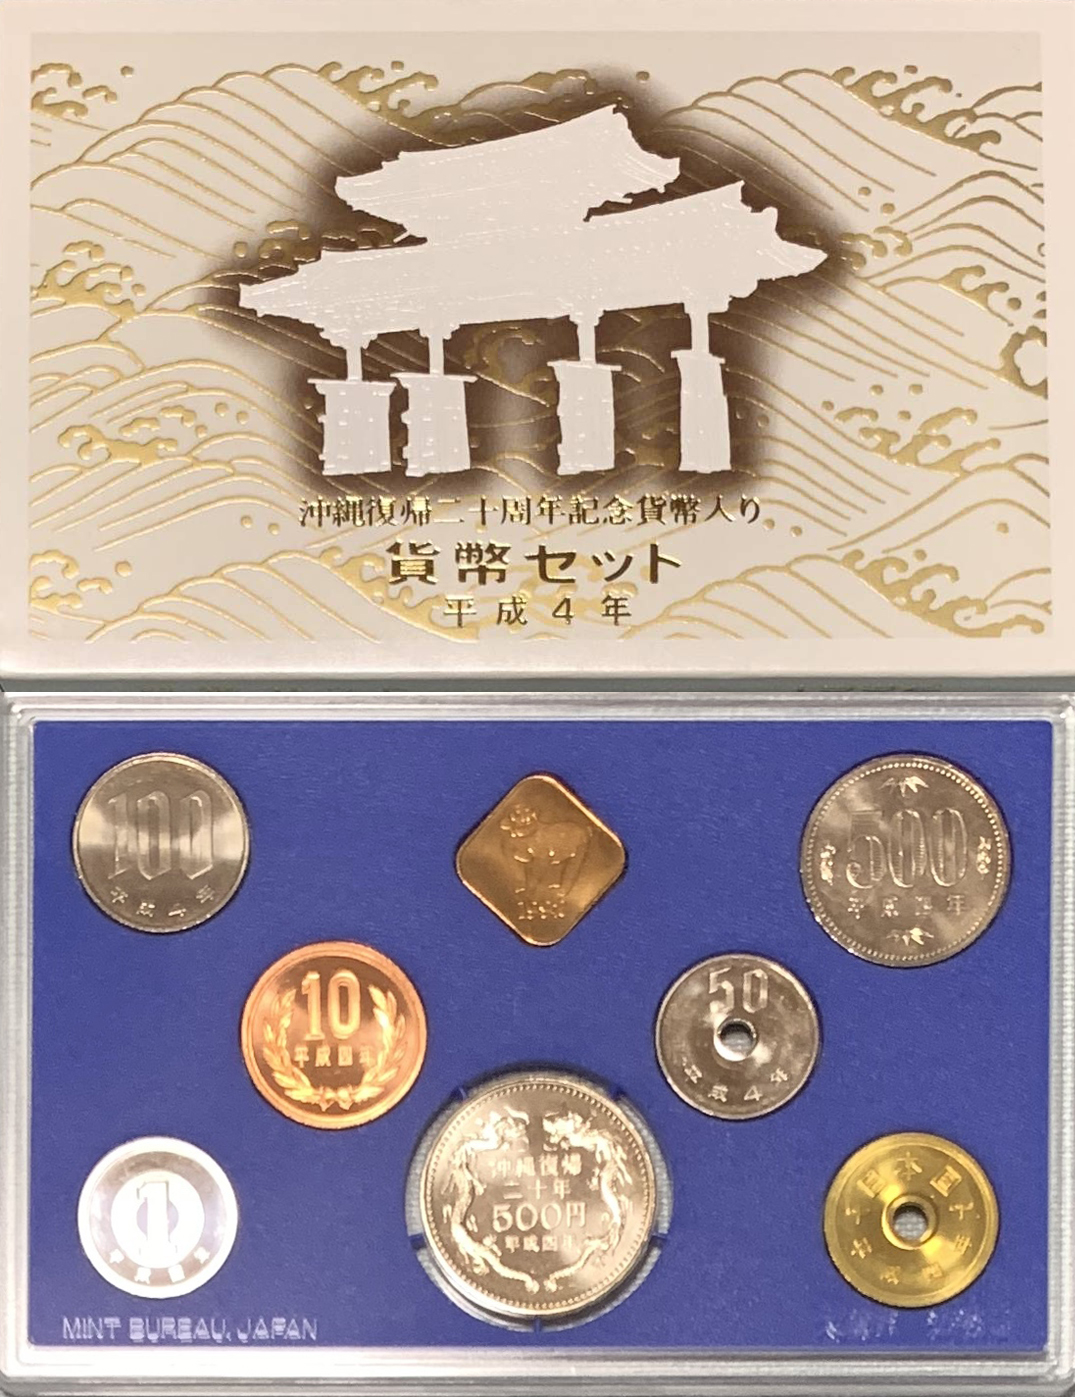 沖縄復帰二十周年記念貨幣入り貨幣セット平成4年